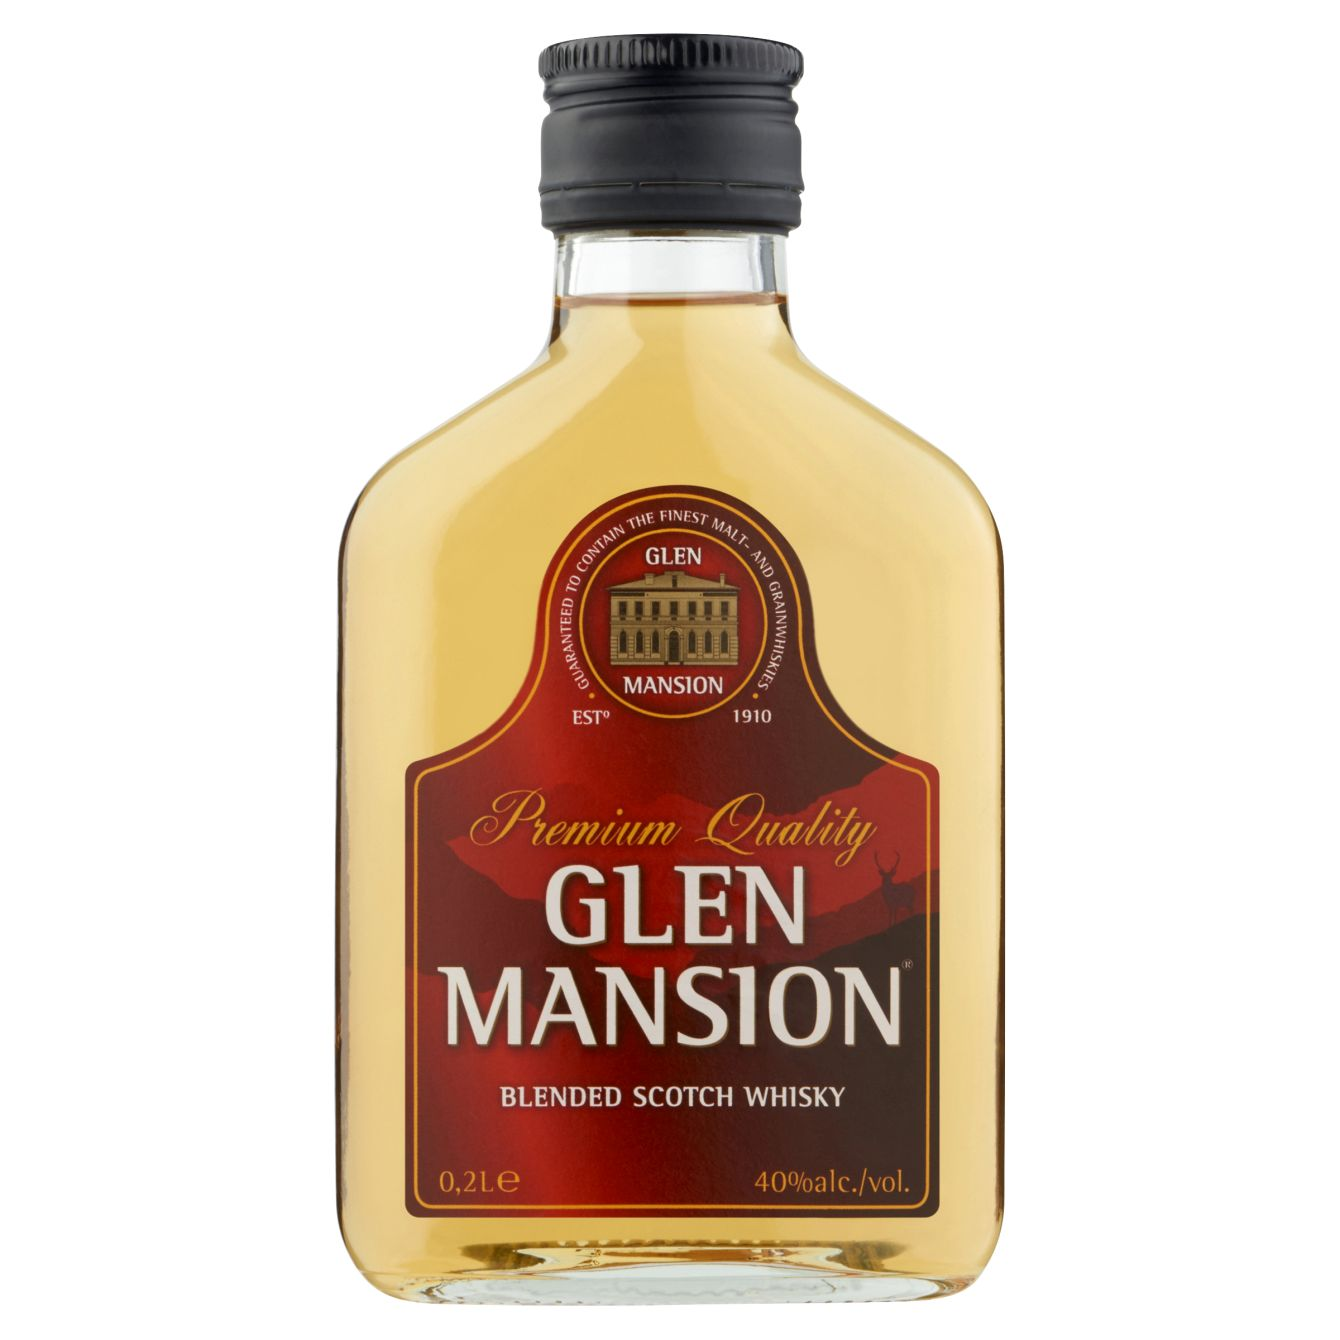 Glen Mansion Blended Scotch Whisky